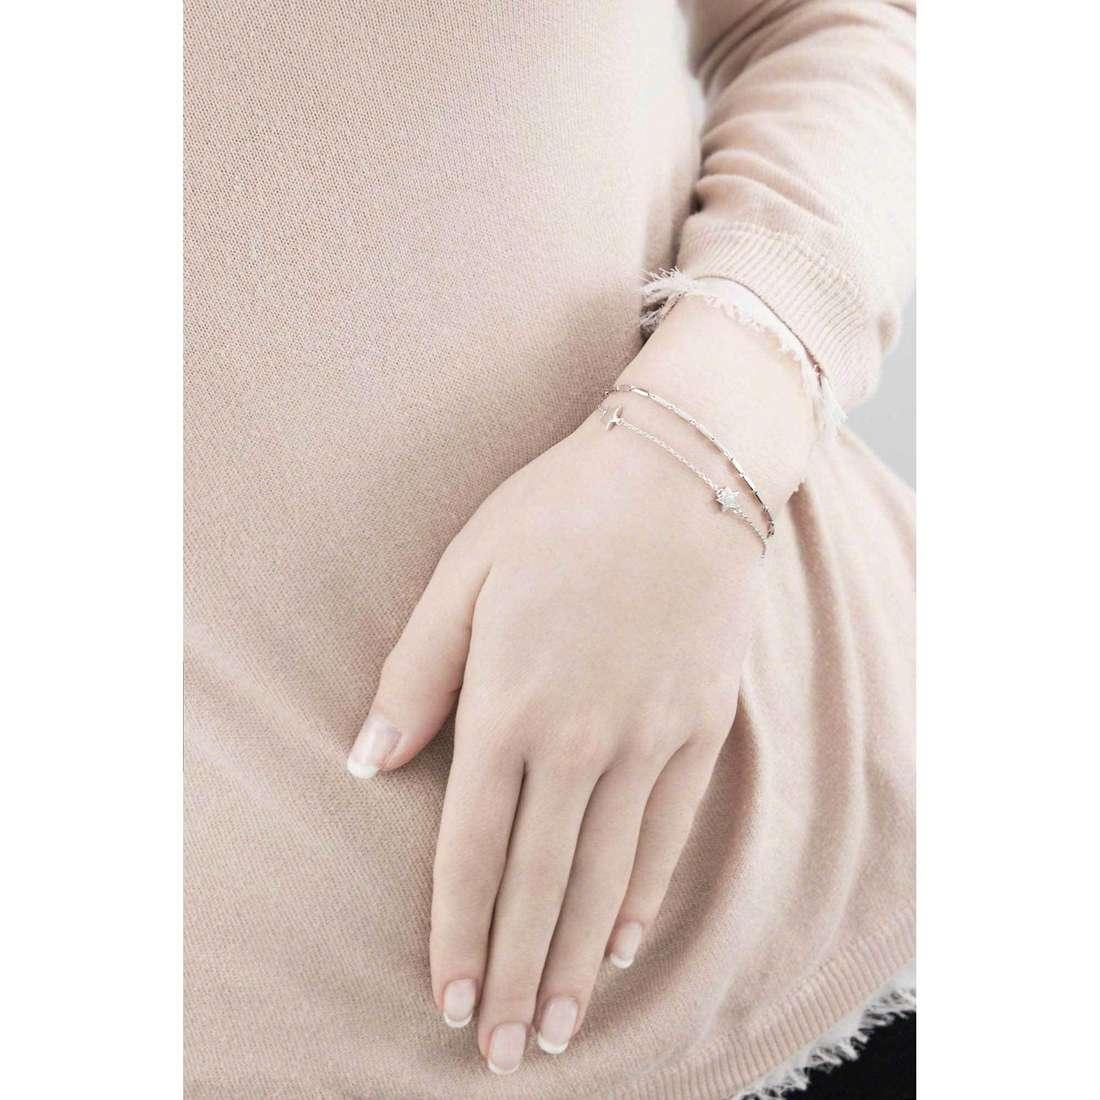 Brosway bracelets Etoile femme G9ET13 indosso